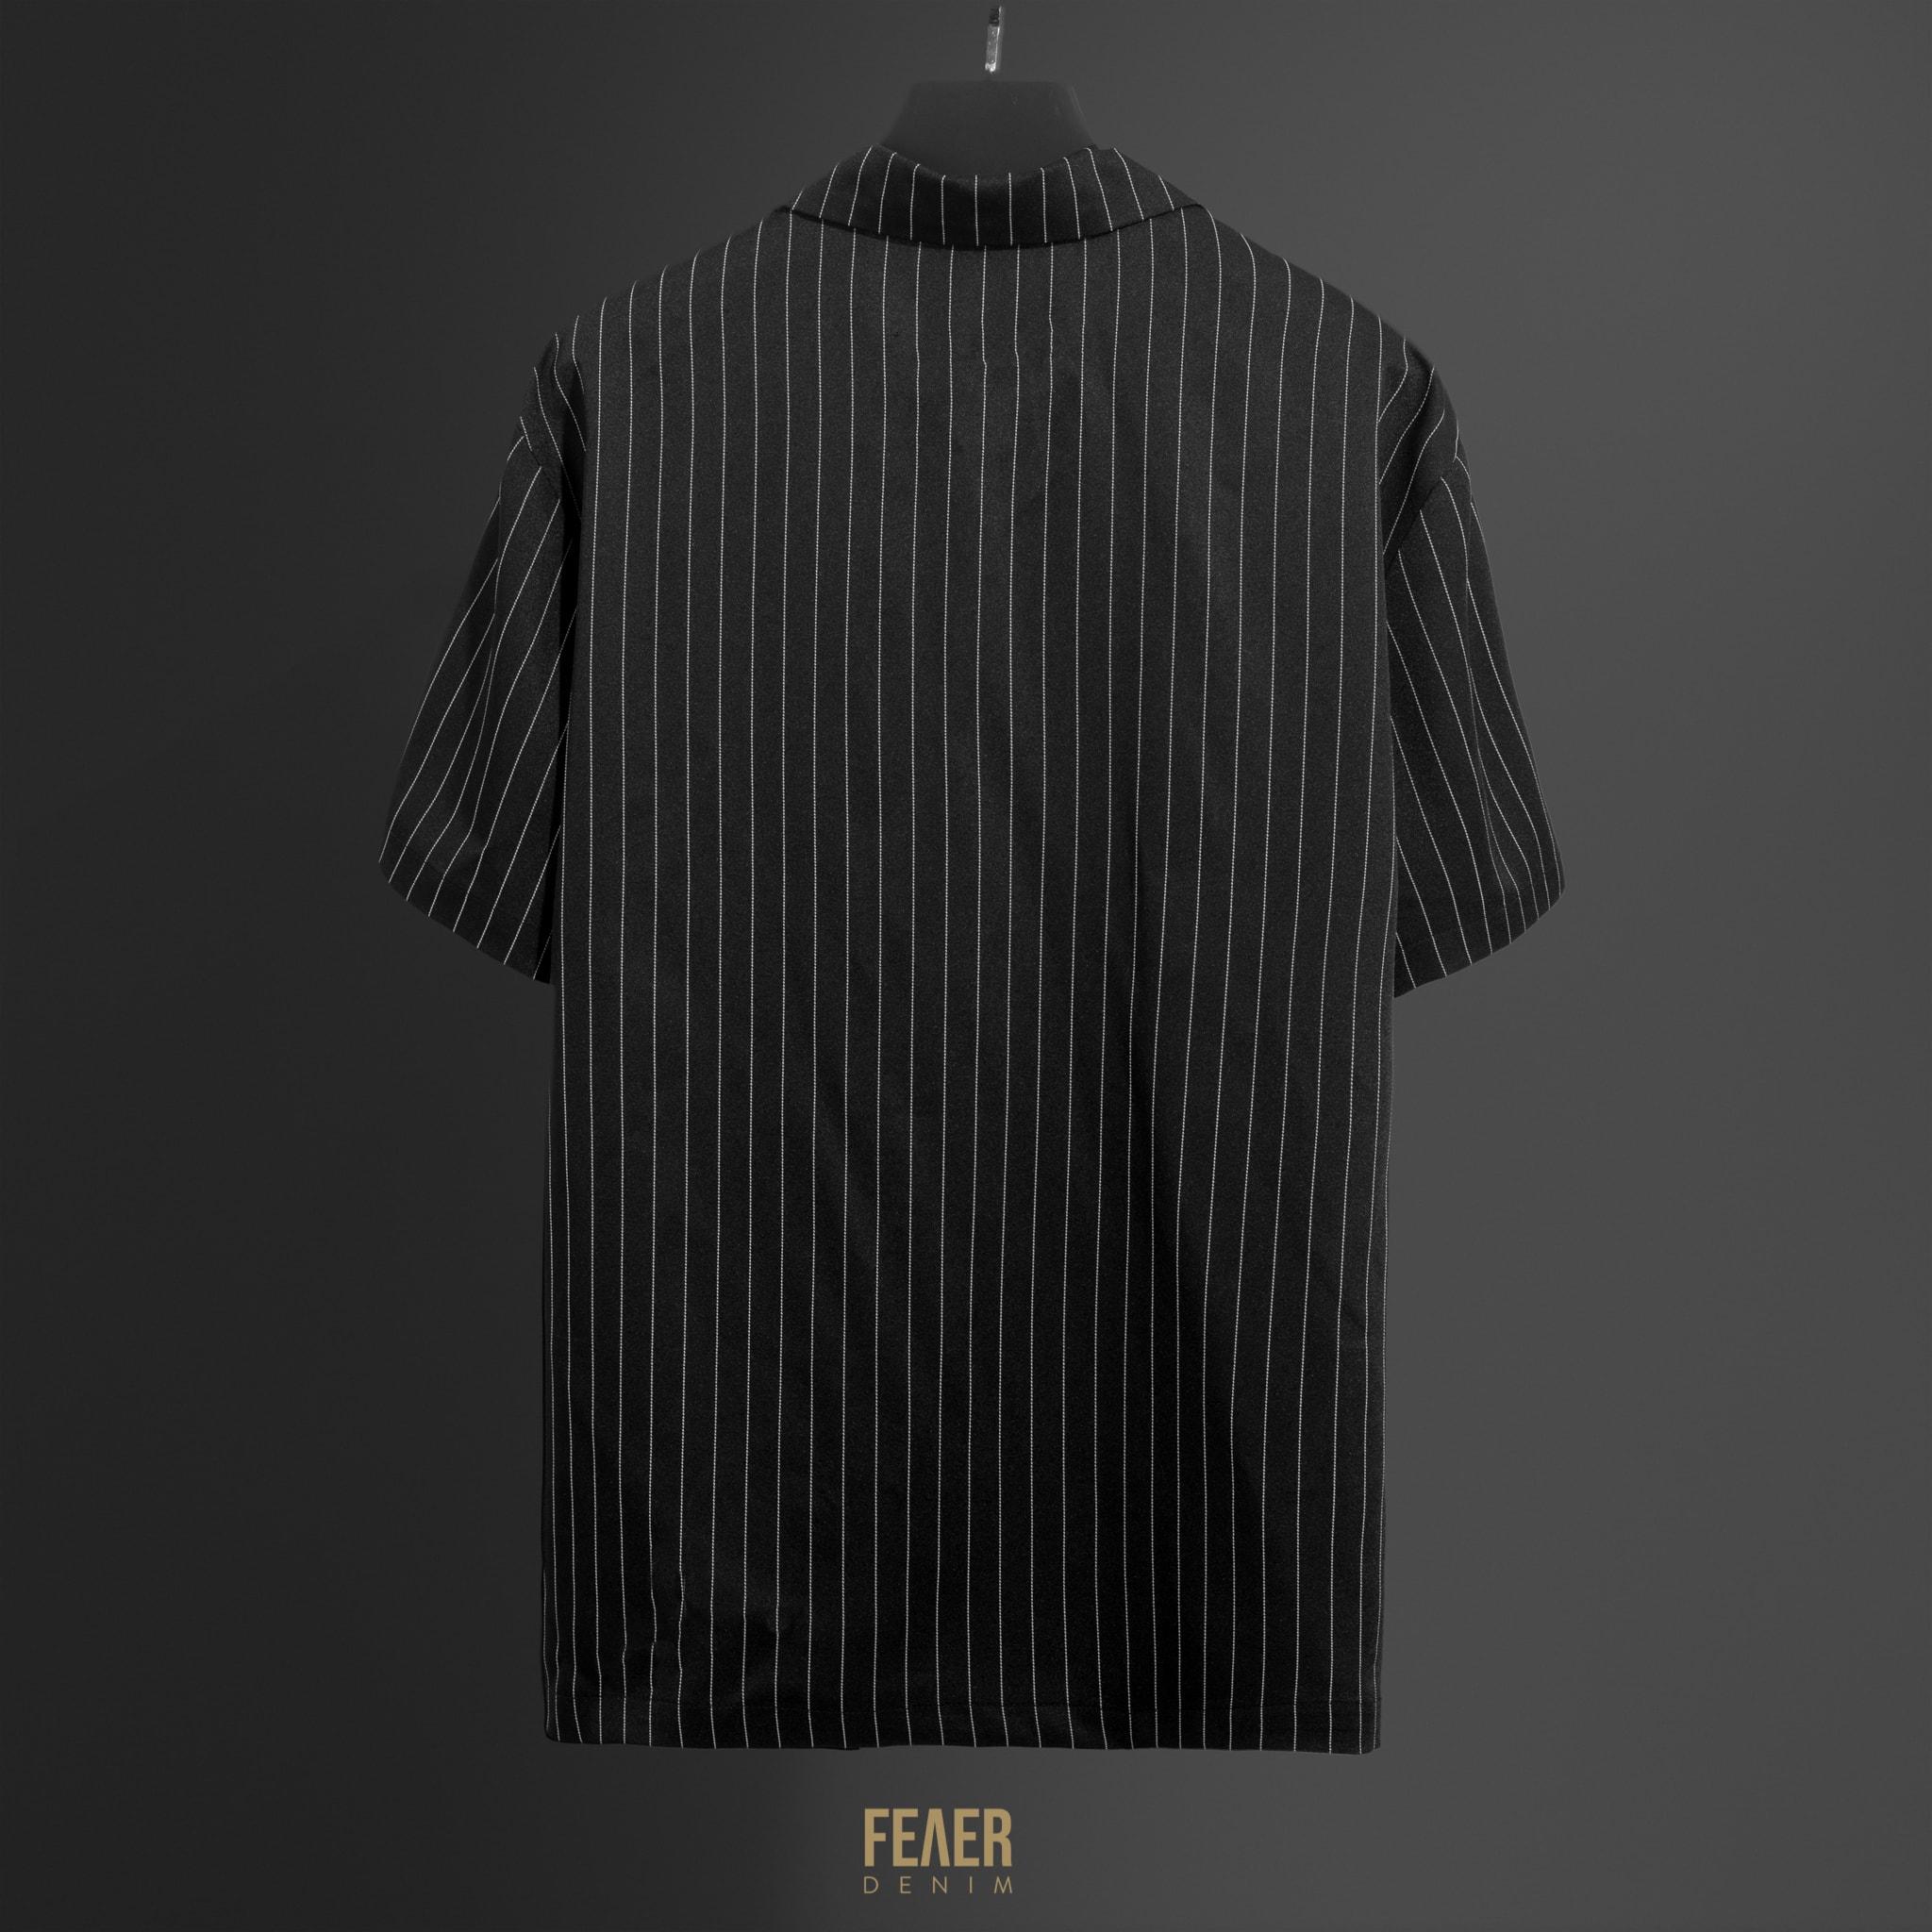 SP133 - Áo Striped Feaer